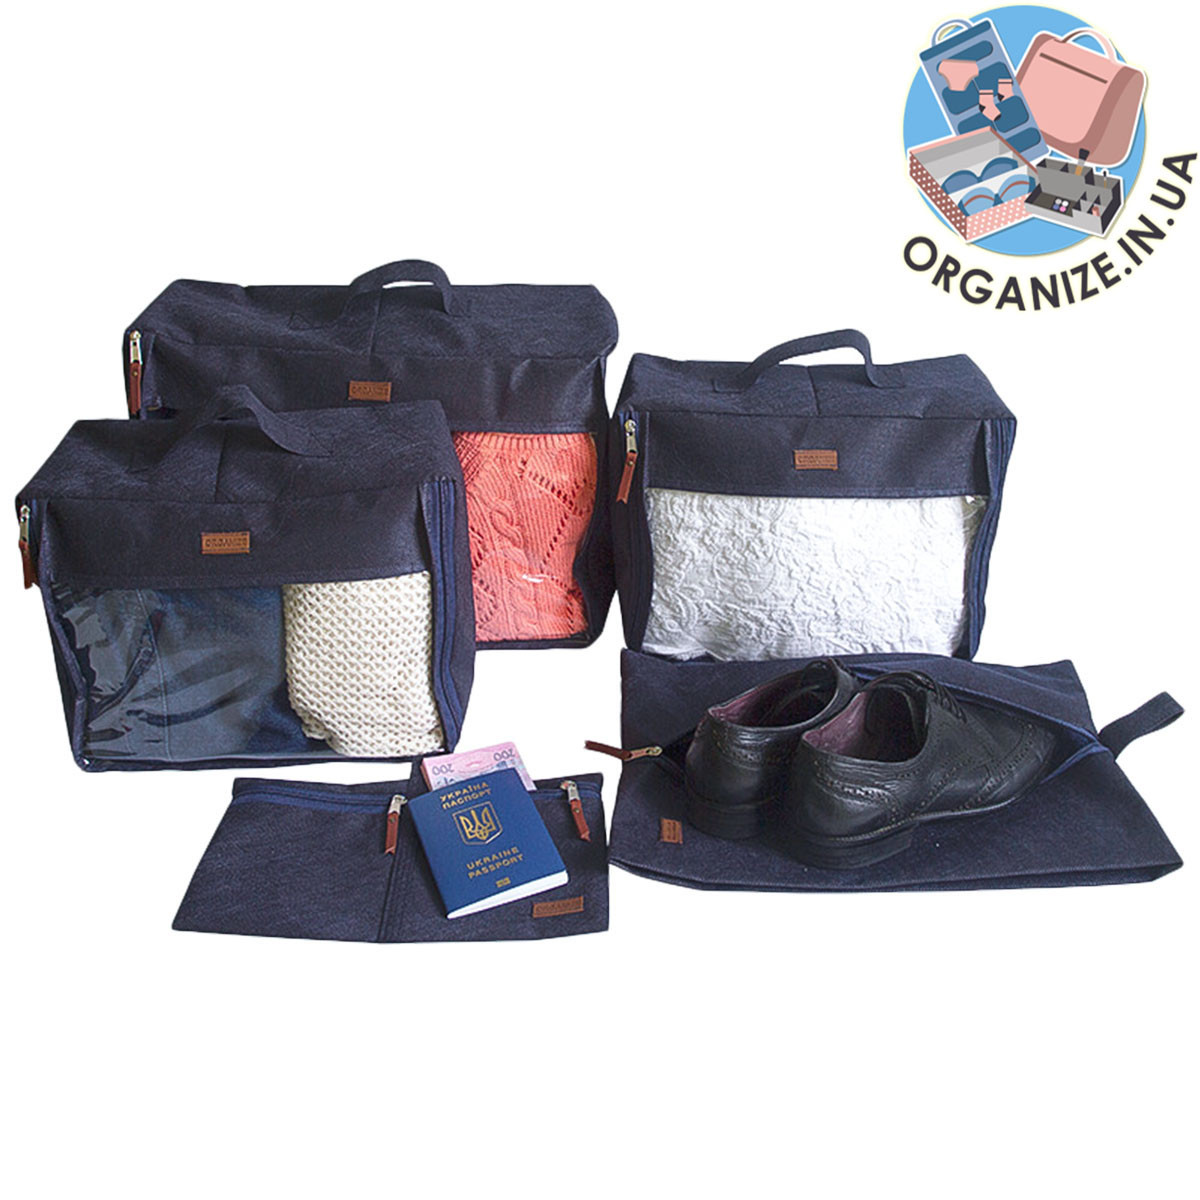 Набор сумок для вещей в чемодан 5 шт ORGANIZE (синий)